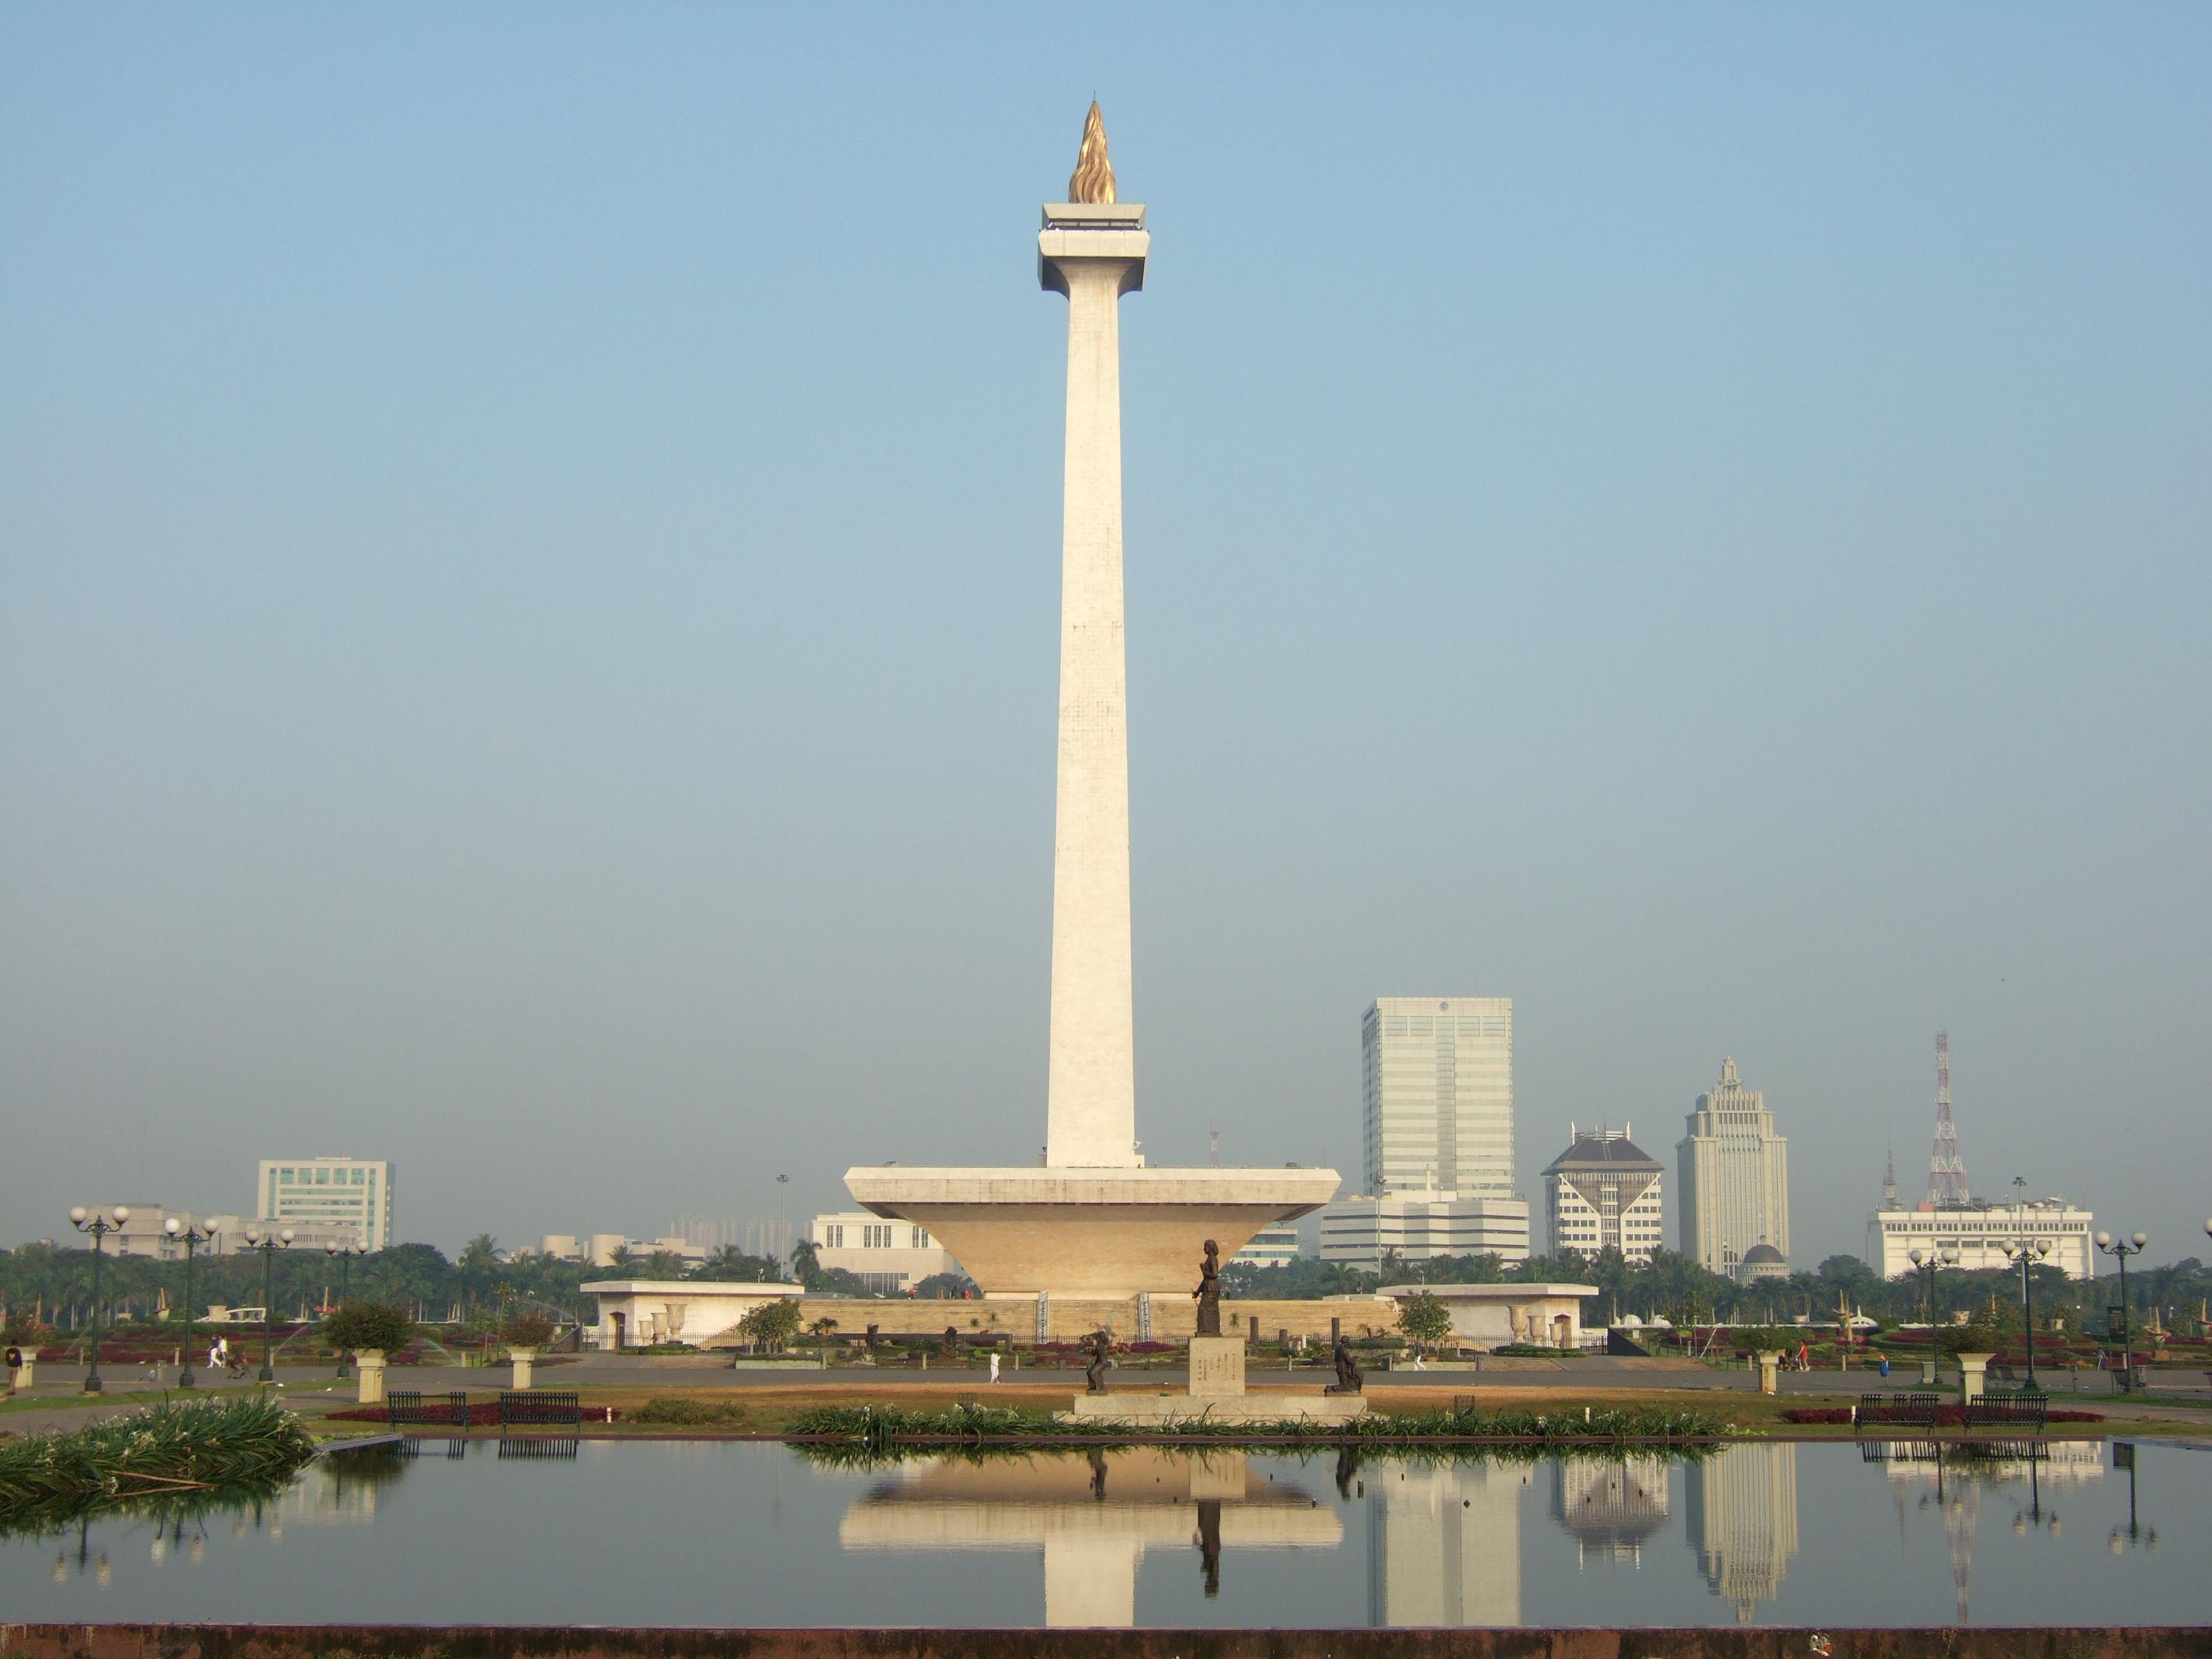 Monas (National Monument), Jakarta